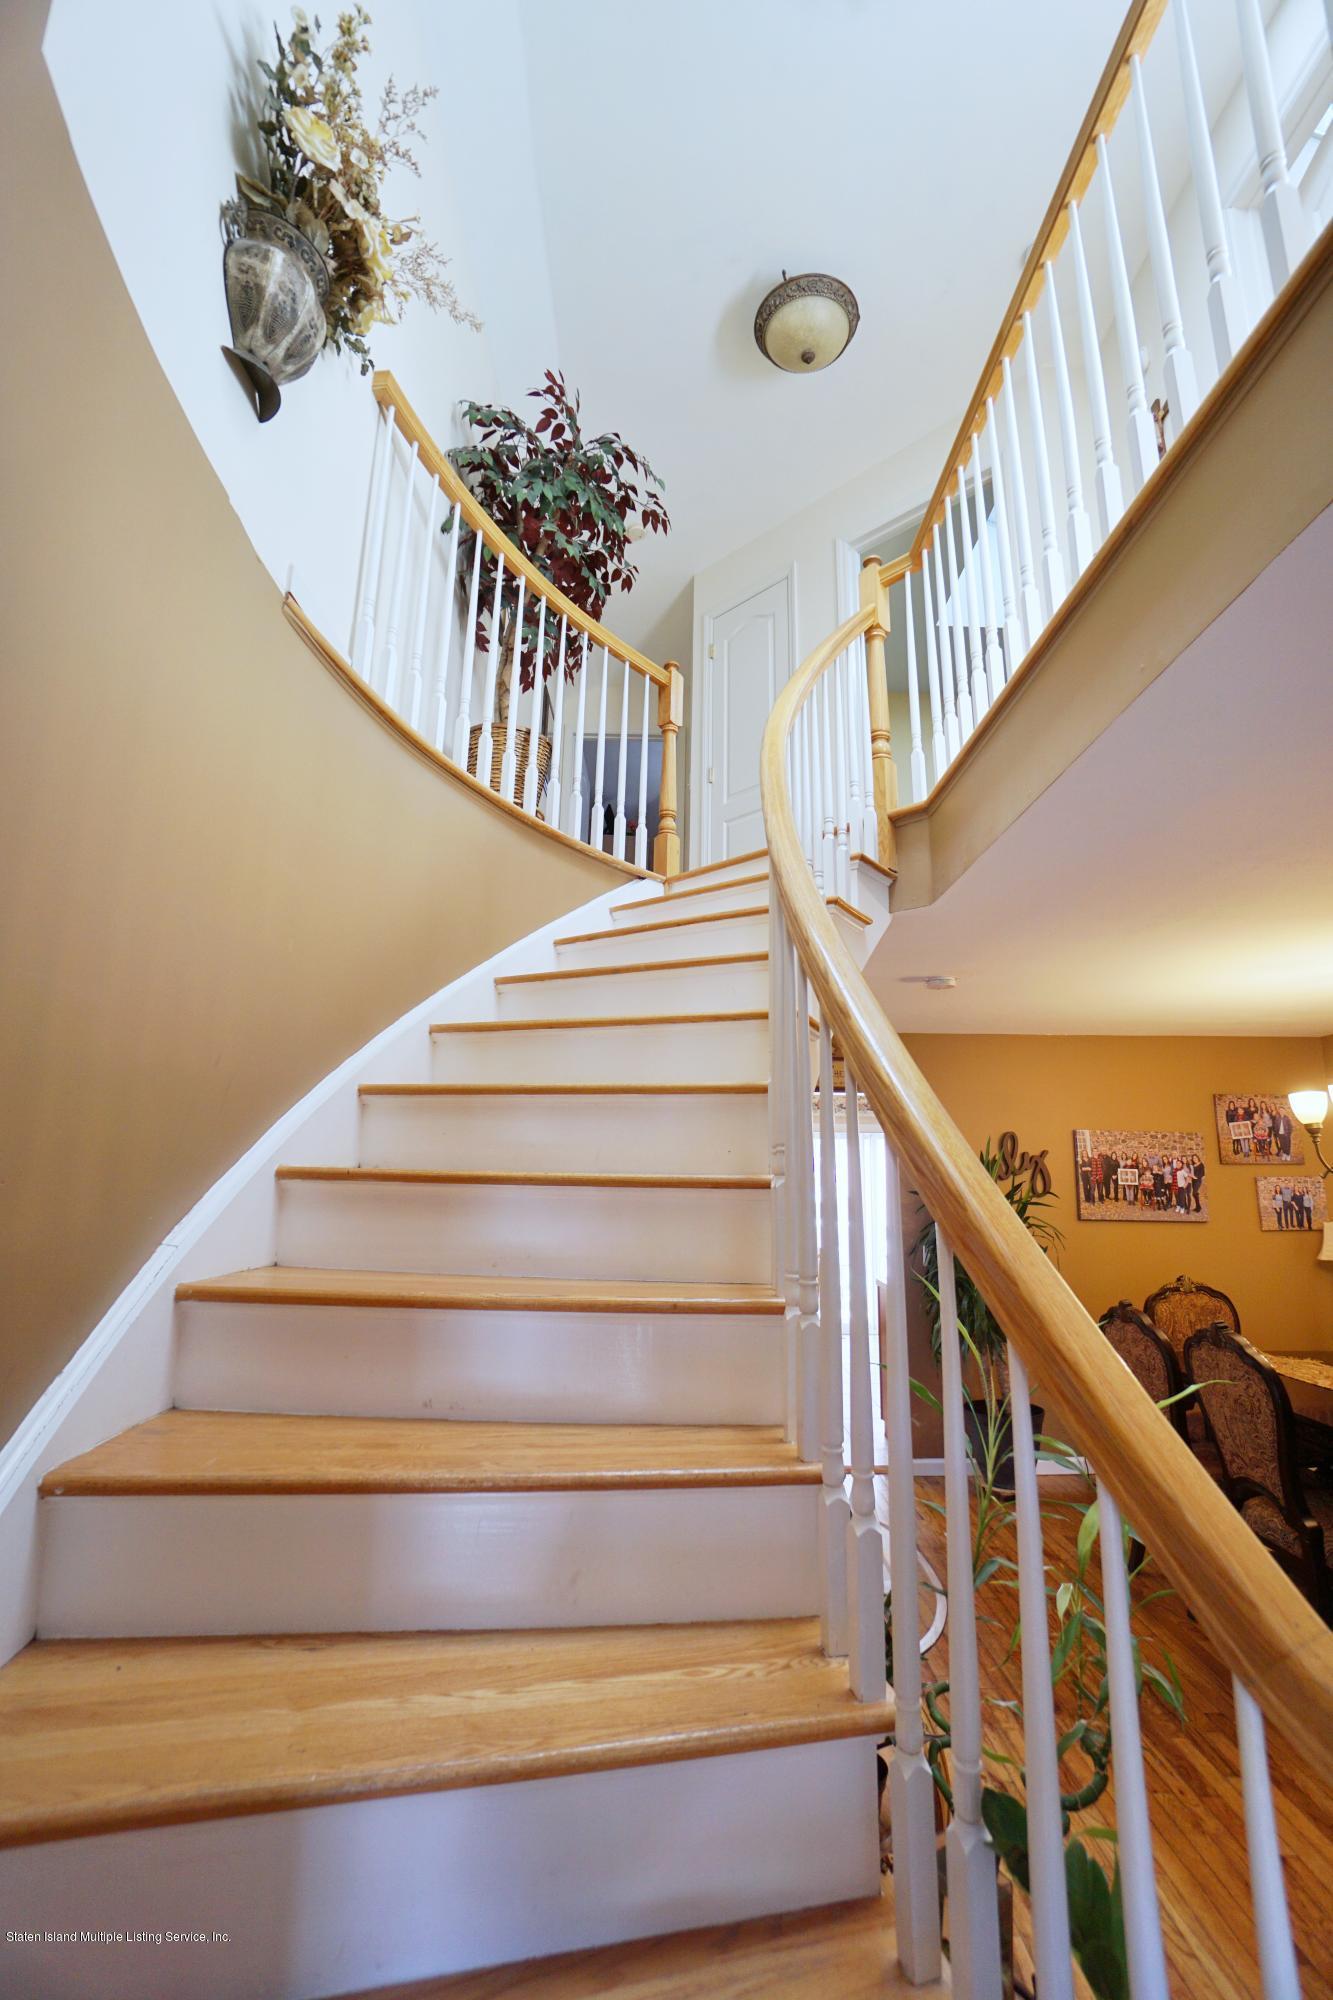 Single Family - Attached 114 Herrick Avenue  Staten Island, NY 10309, MLS-1137235-3